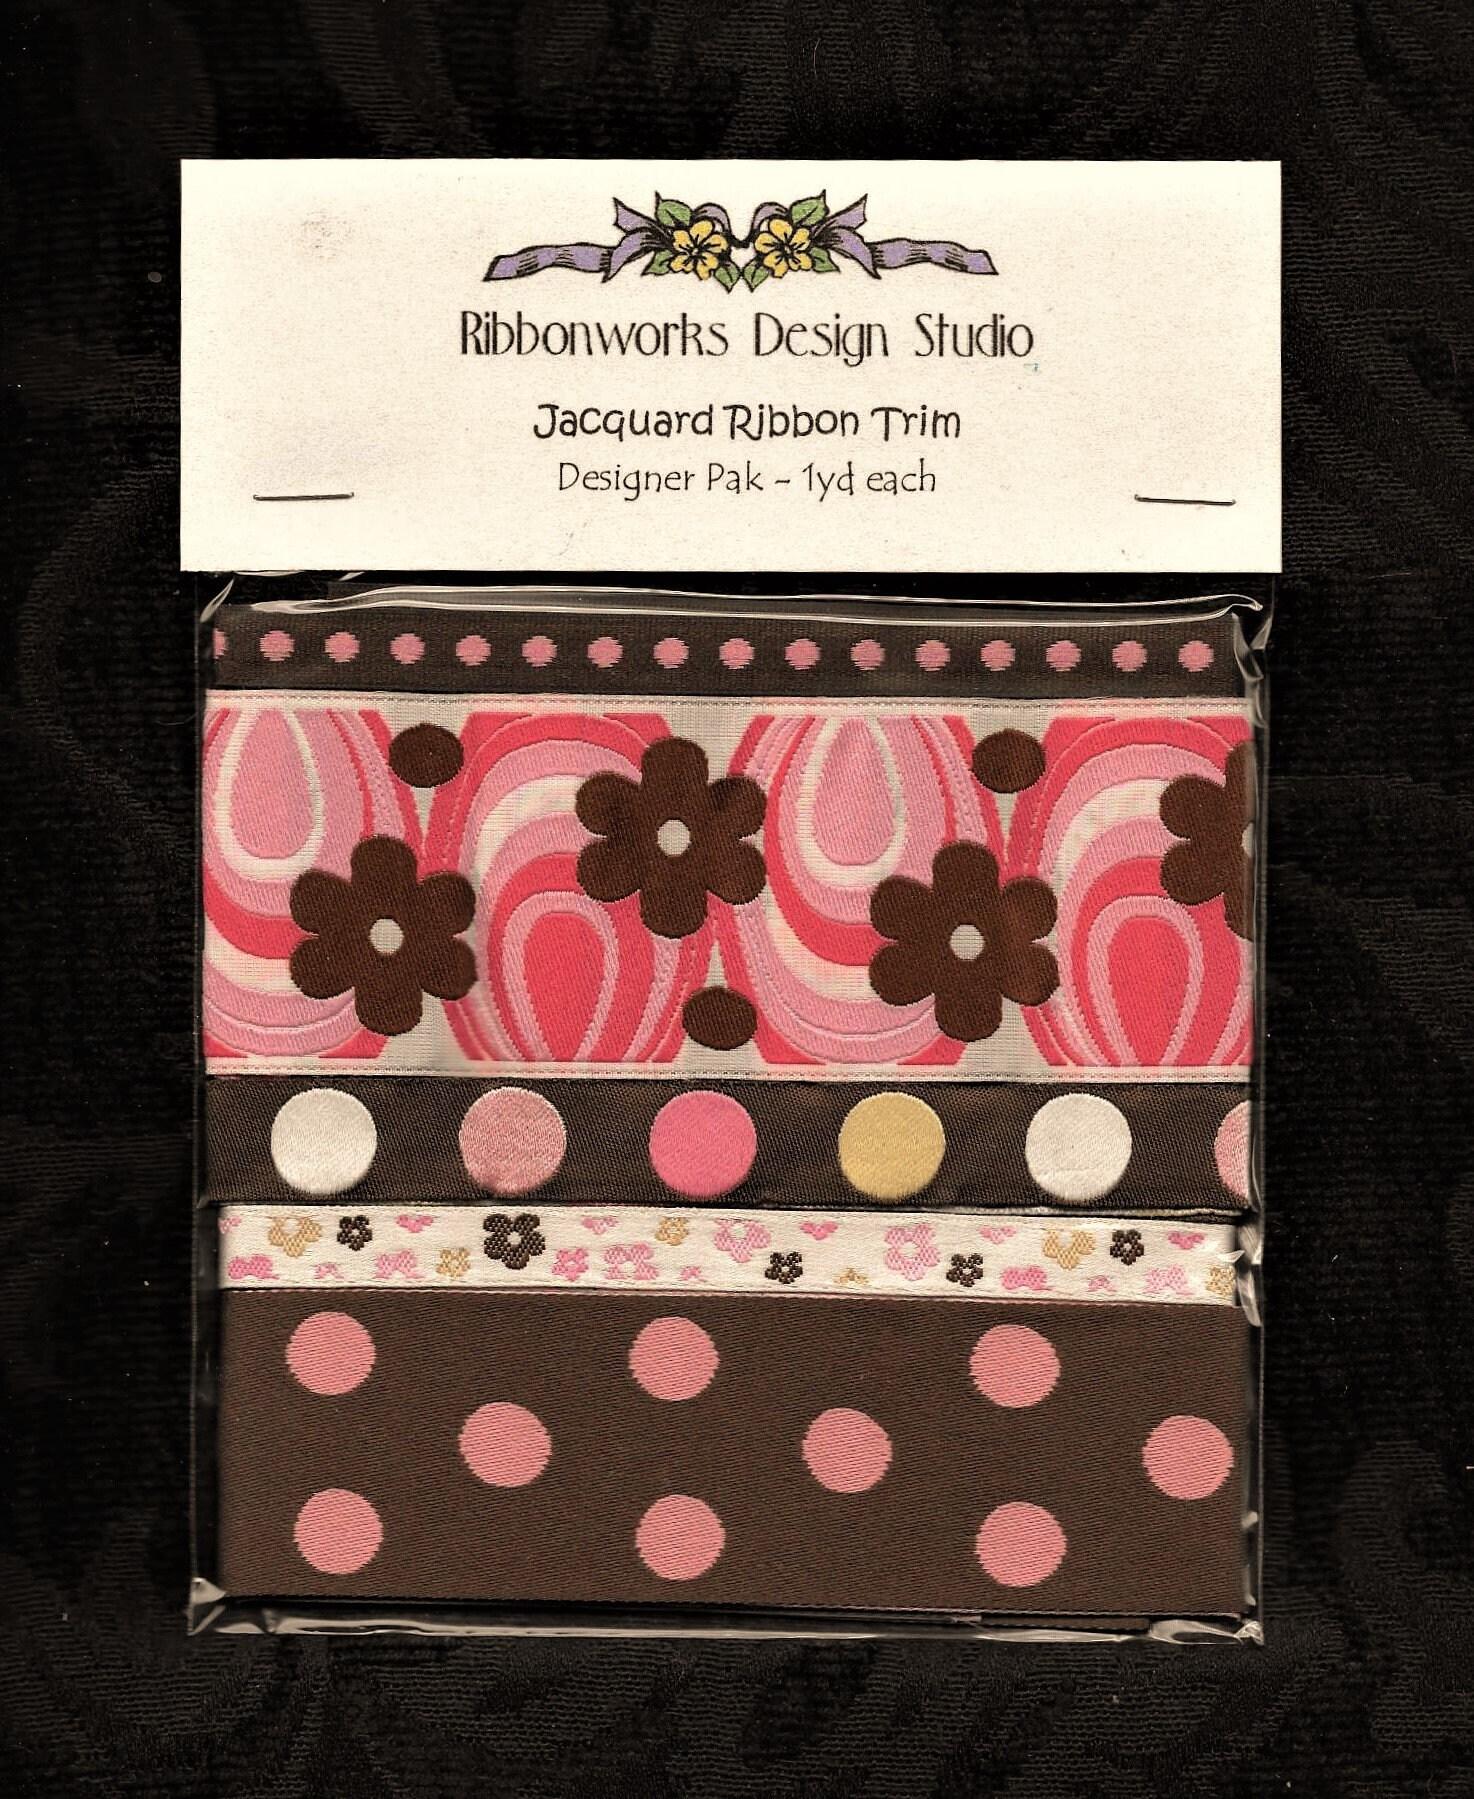 RUBAN RUBAN RUBAN de DESIGNER PAK-8, bordure en ruban Jacquard, Polyester, 1 yard chacune de 5 différents rubans, chocolat, blanc, rose et Ivoire Floral/Polka Dots f3995c